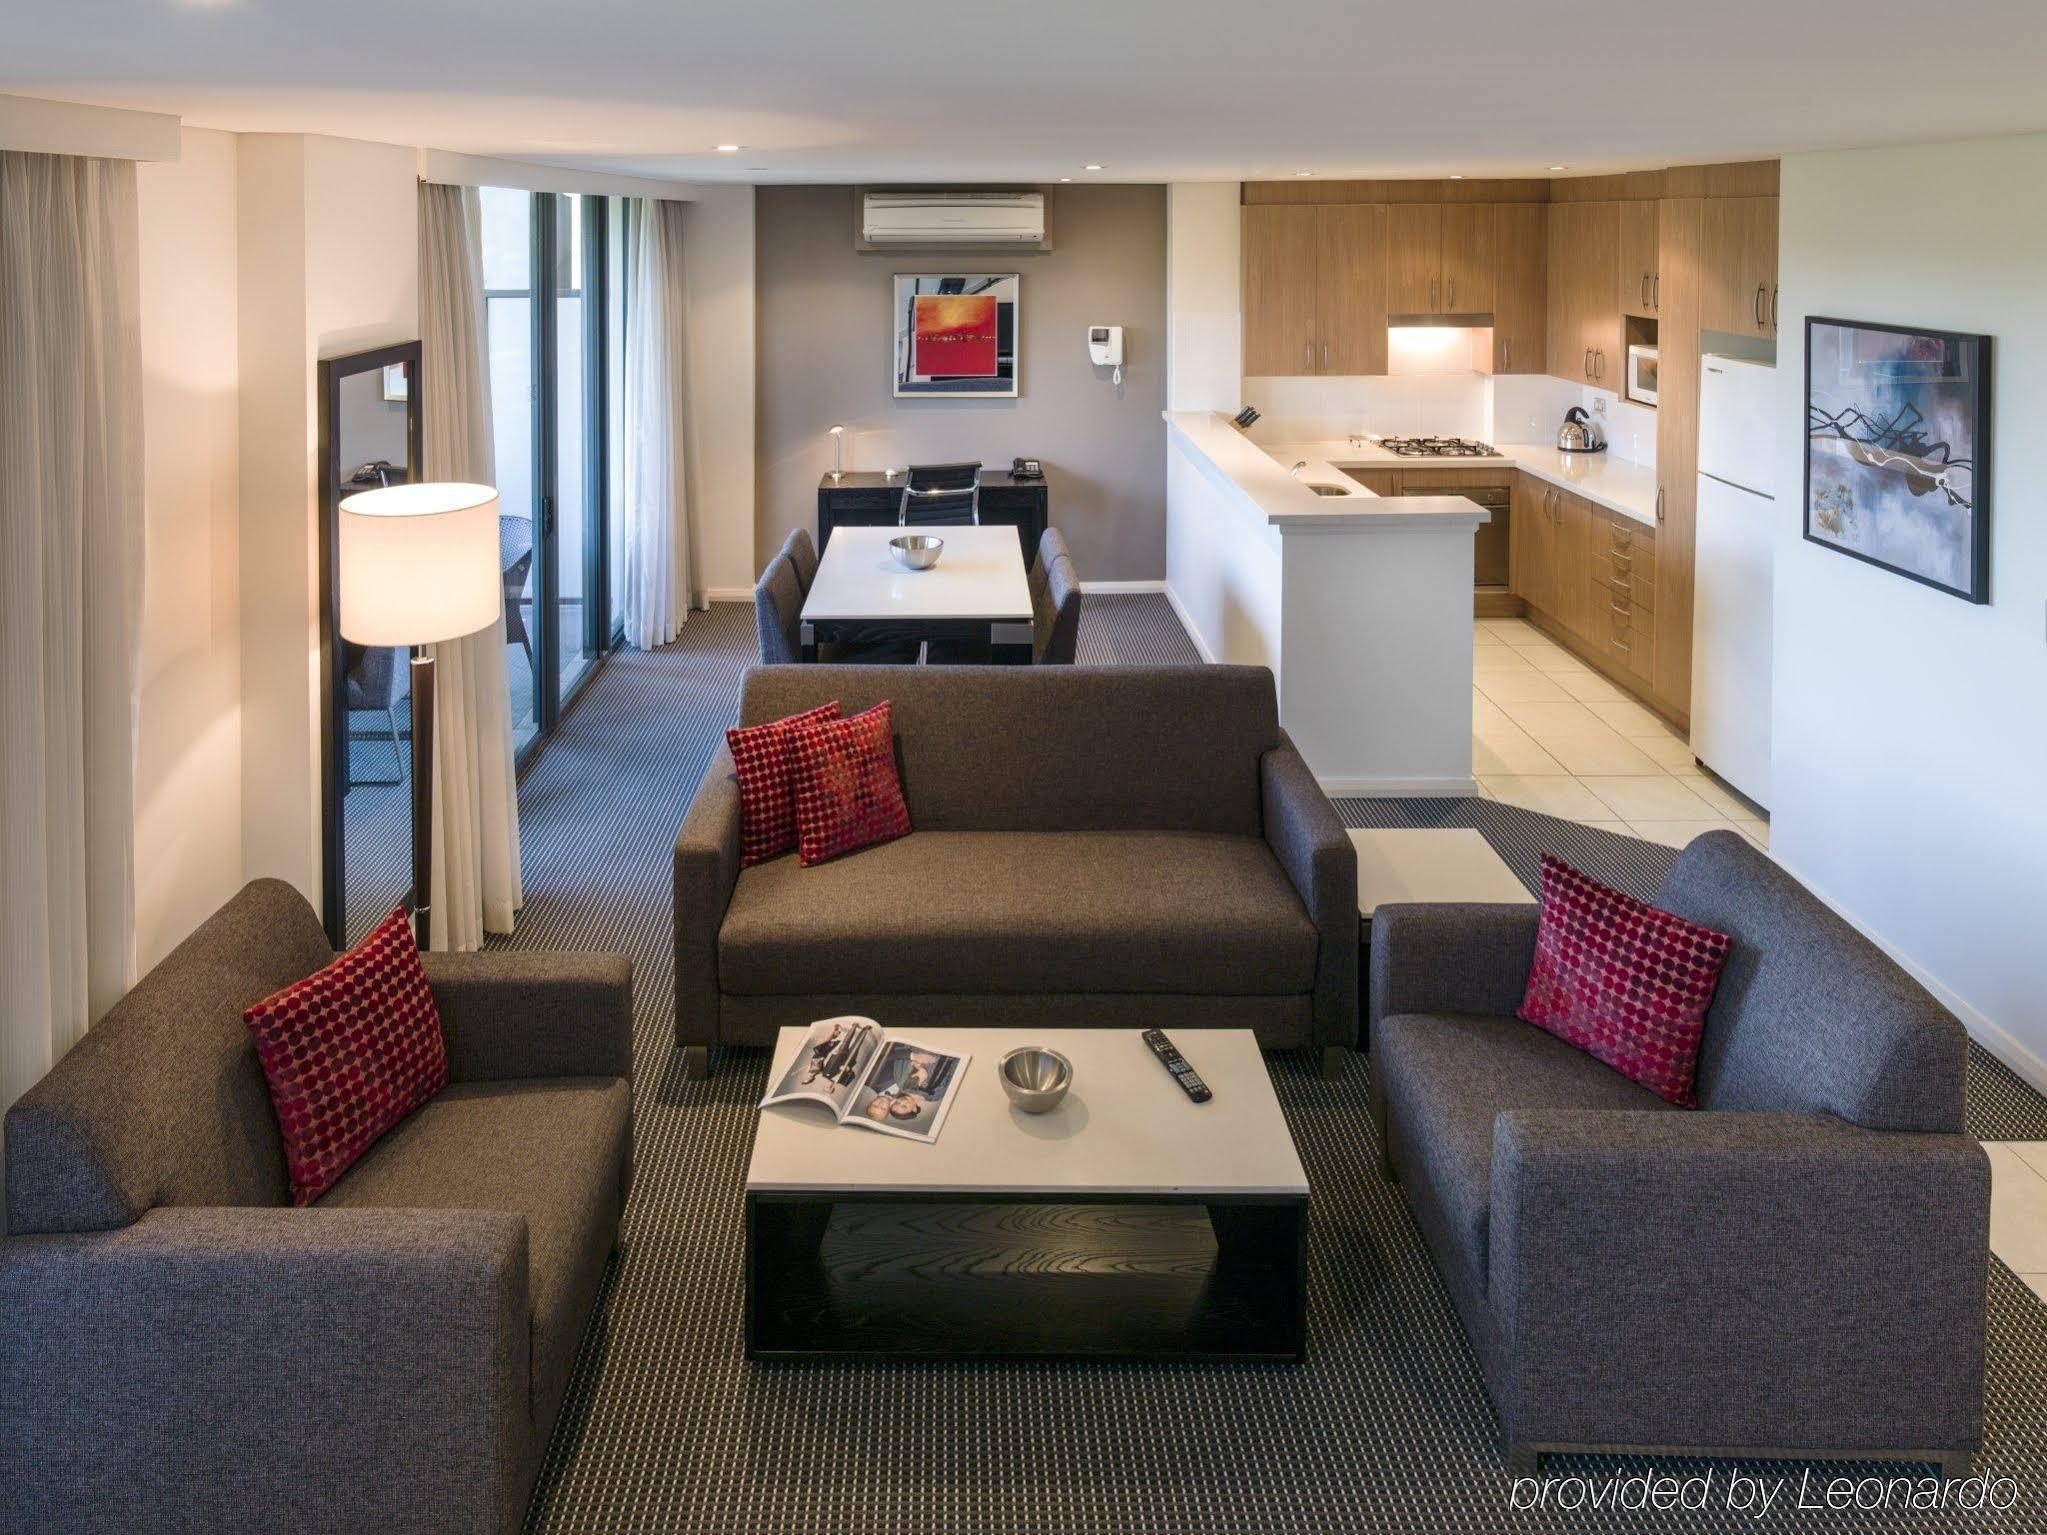 Meriton Serviced Apartments Parramatta